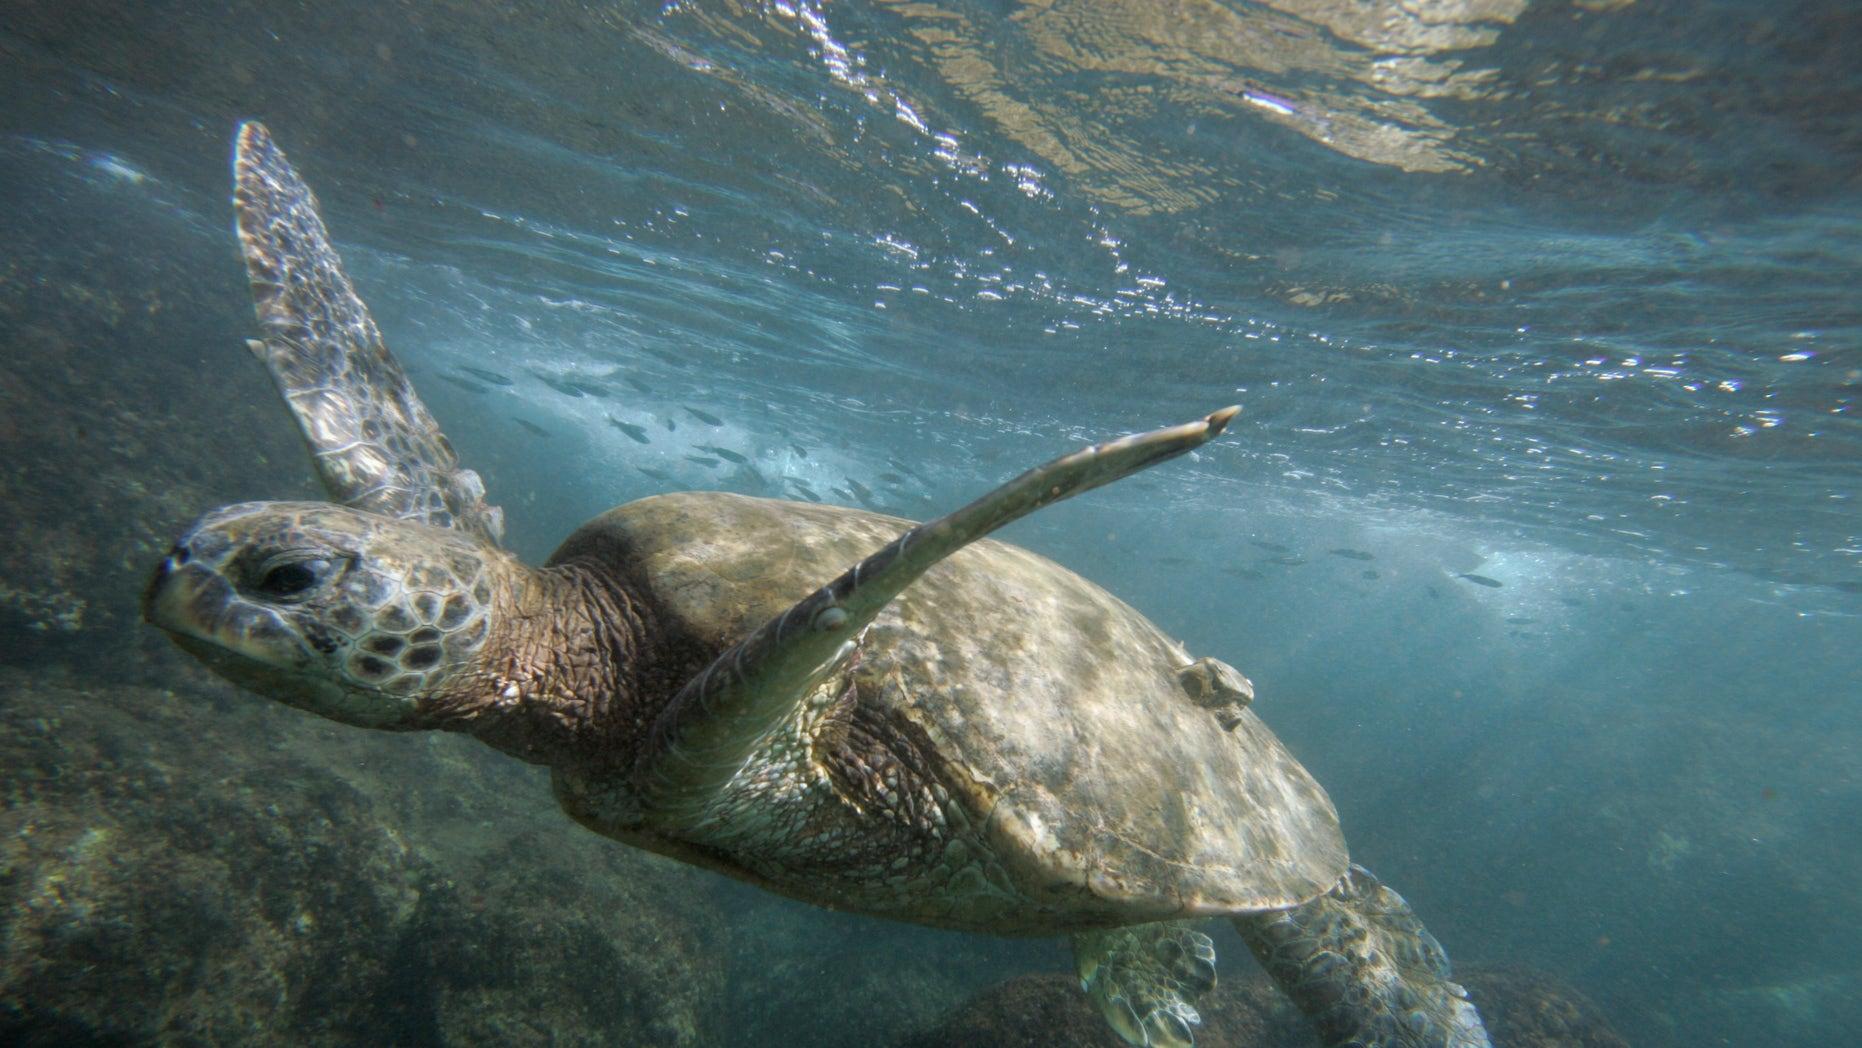 A green sea turtle is seen off the coast of Oahu, Hawaii.